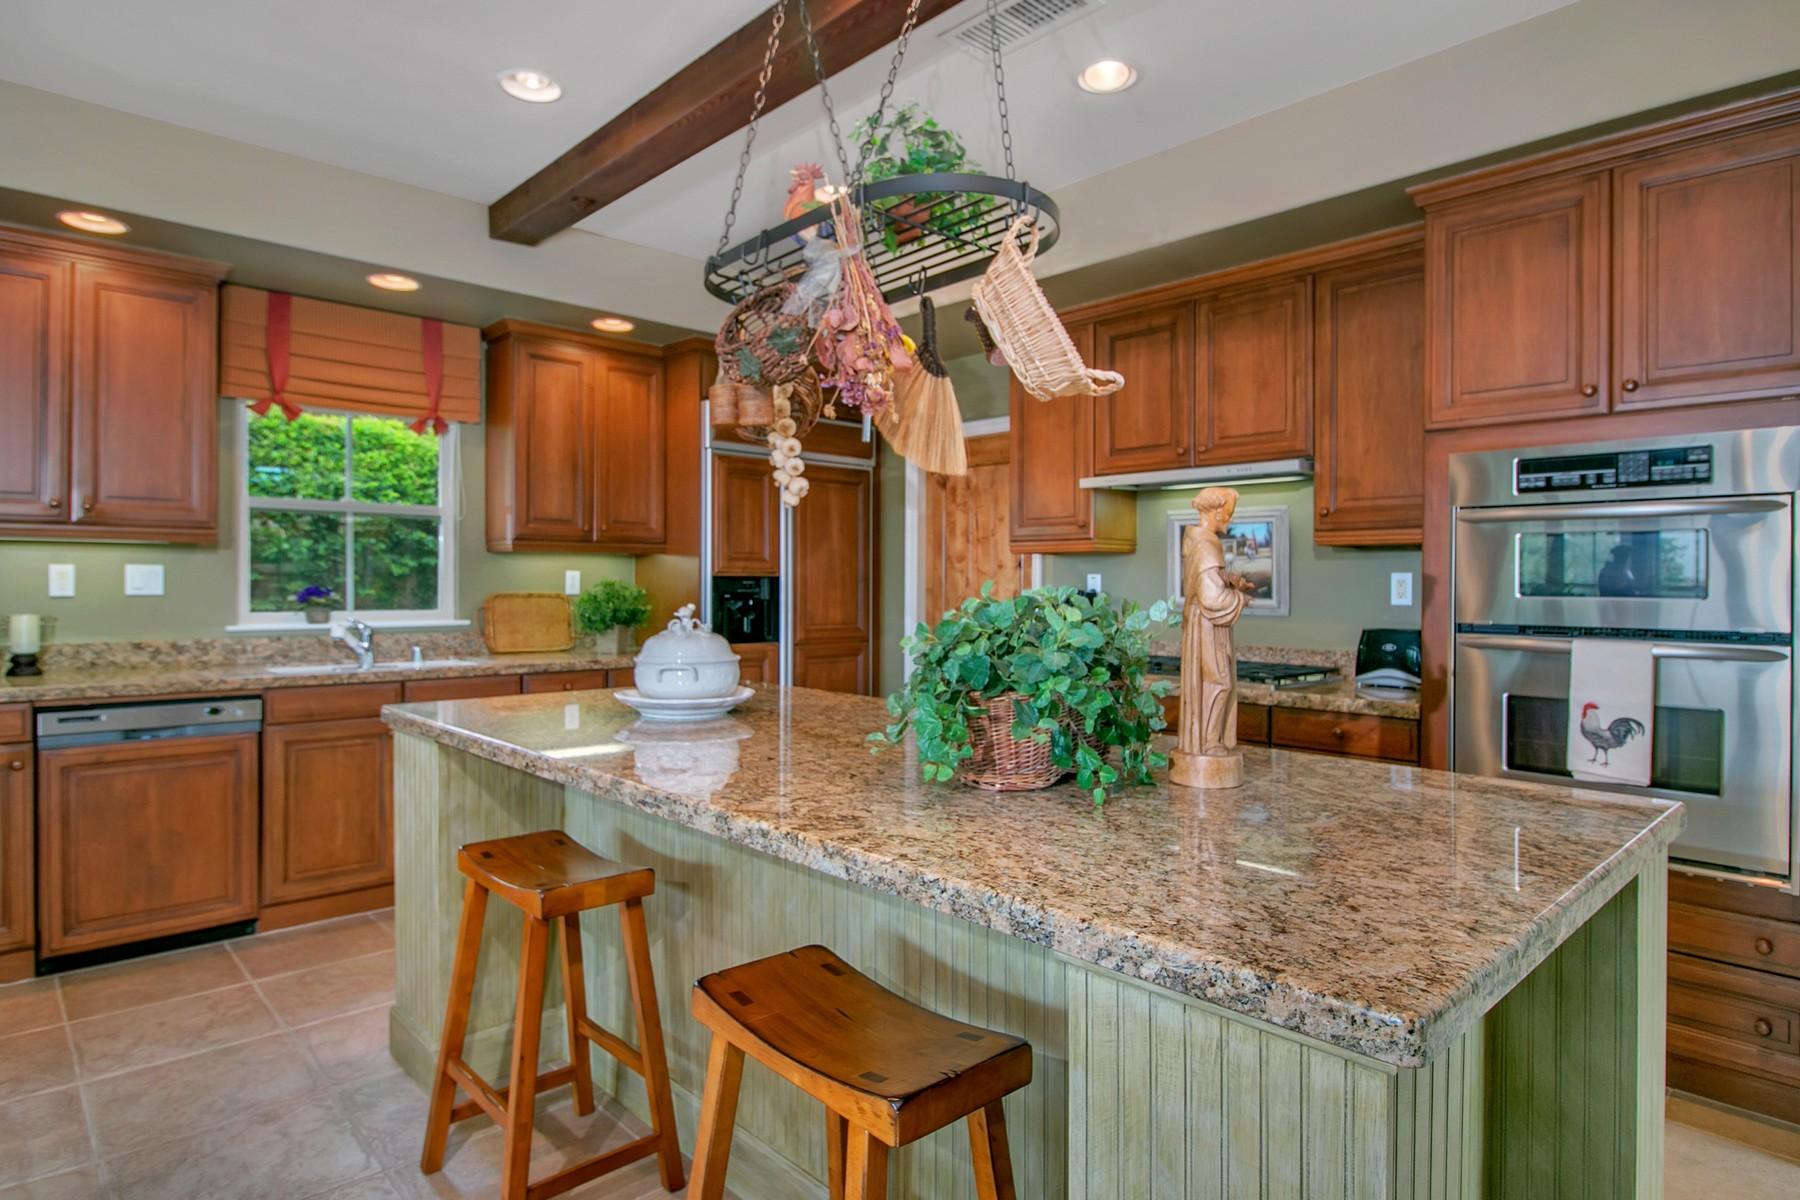 Additional photo for property listing at 7764 Sendero Angelica  圣地亚哥, 加利福尼亚州 92127 美国